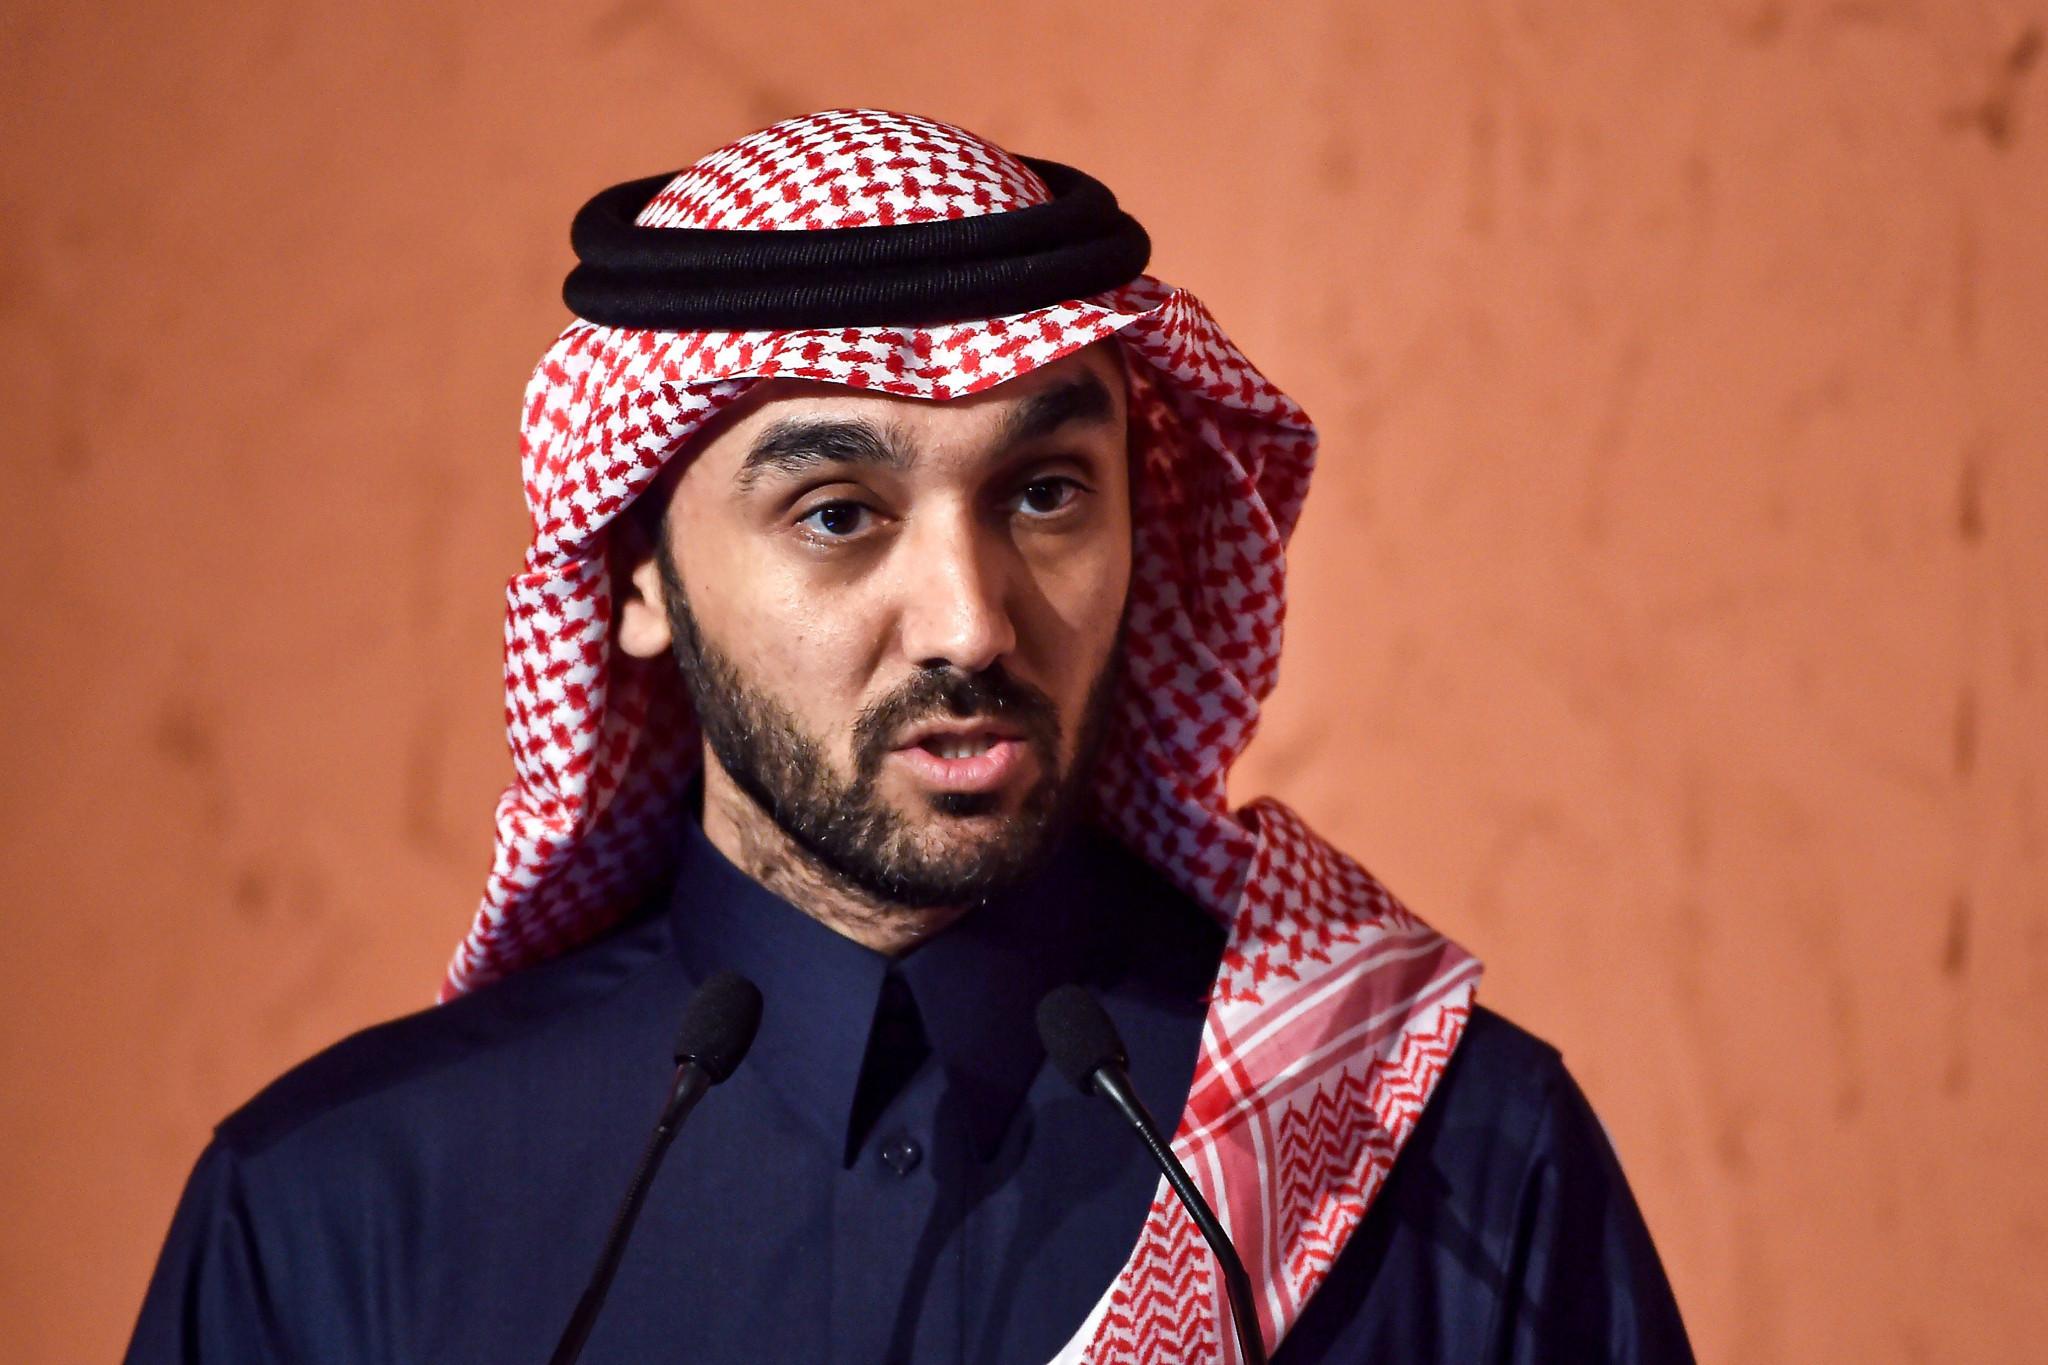 Prince Abdulaziz bin Turki al-Saud is at the centre of Saudi Arabia's sporting ambitions ©Getty Images